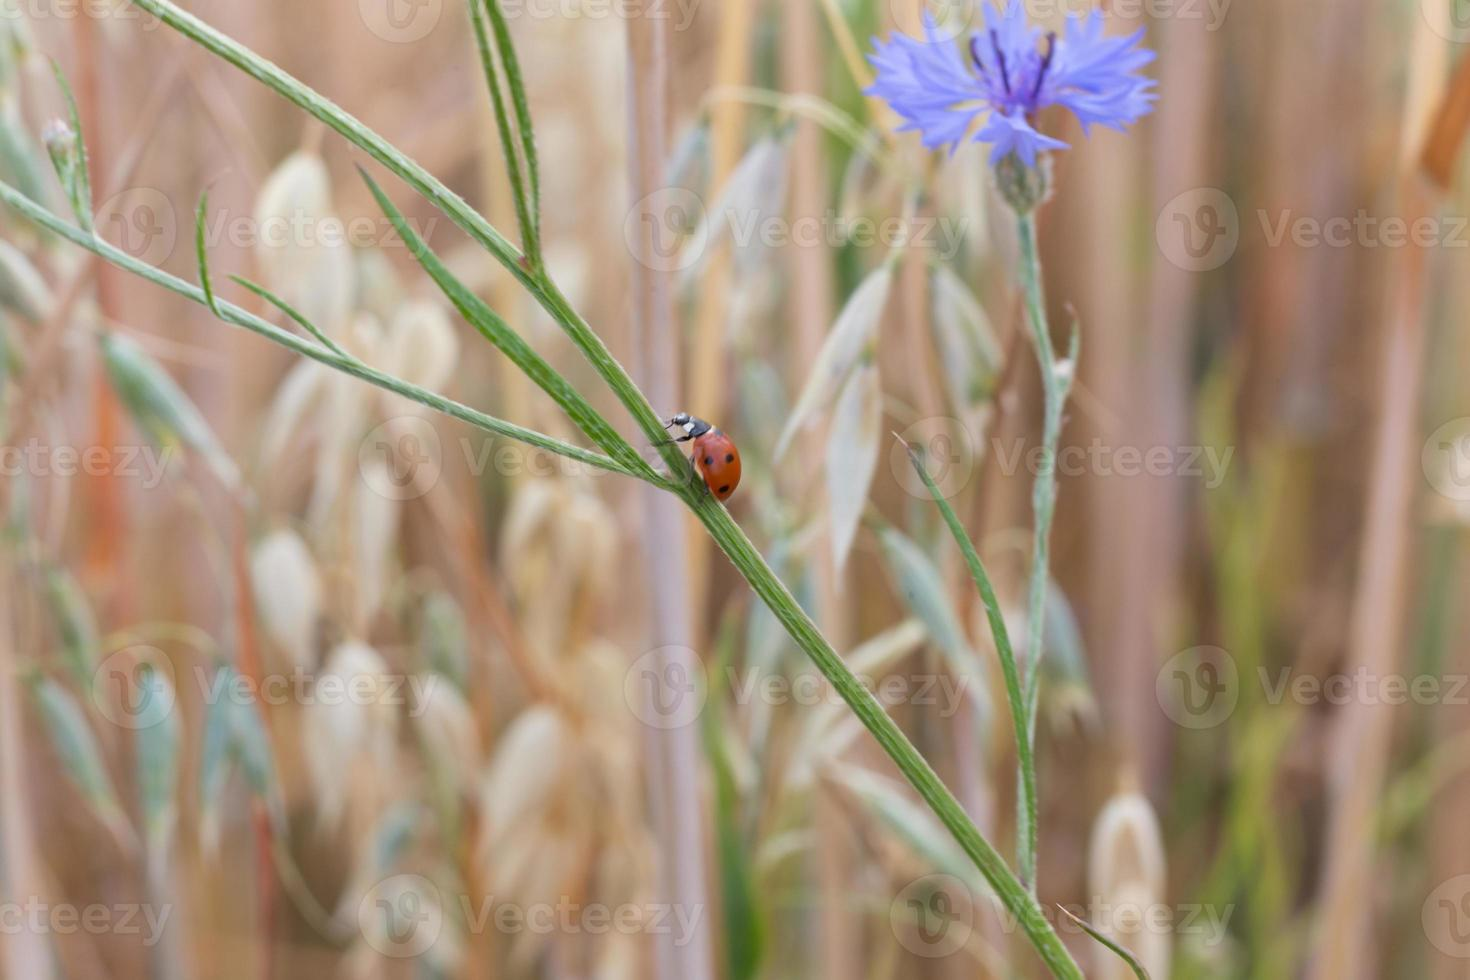 lieveheersbeestje op een hulm foto